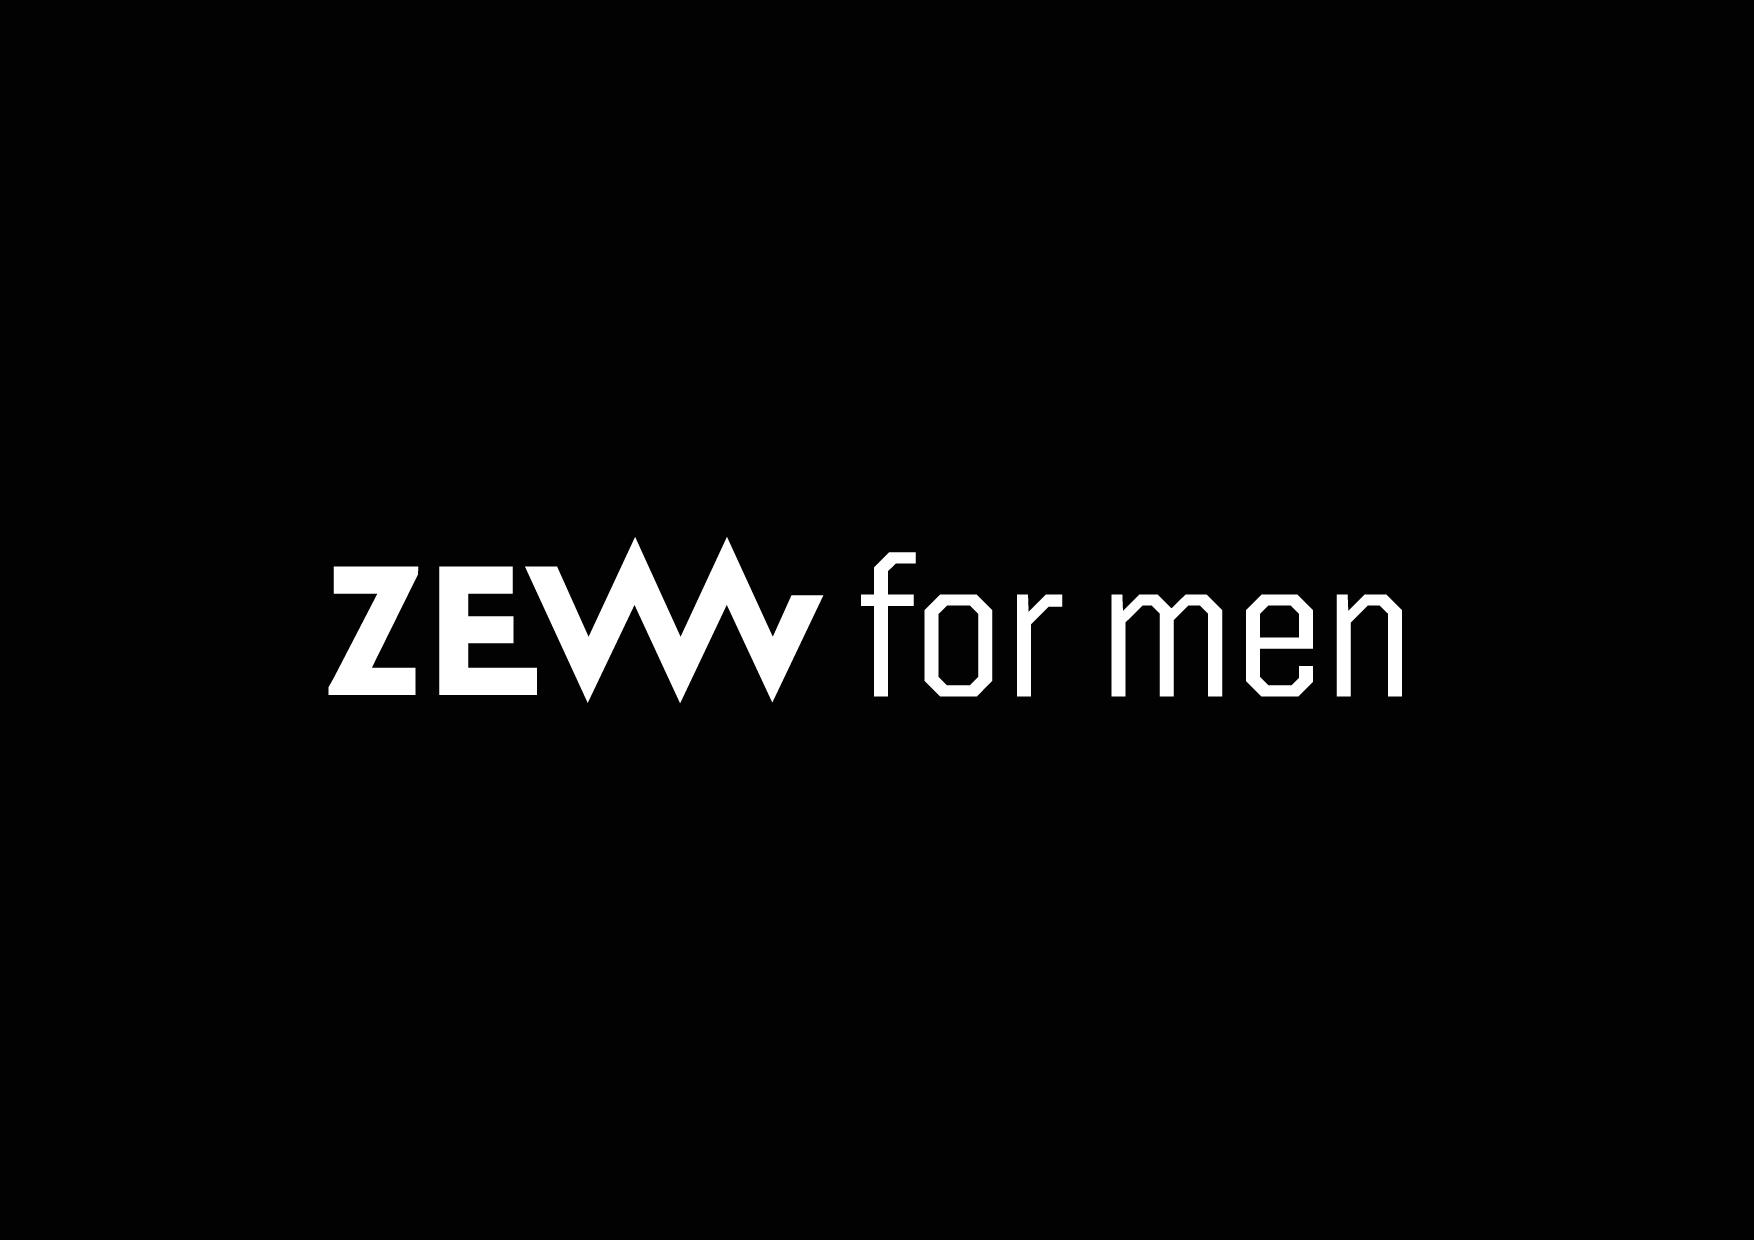 zew-formen-white